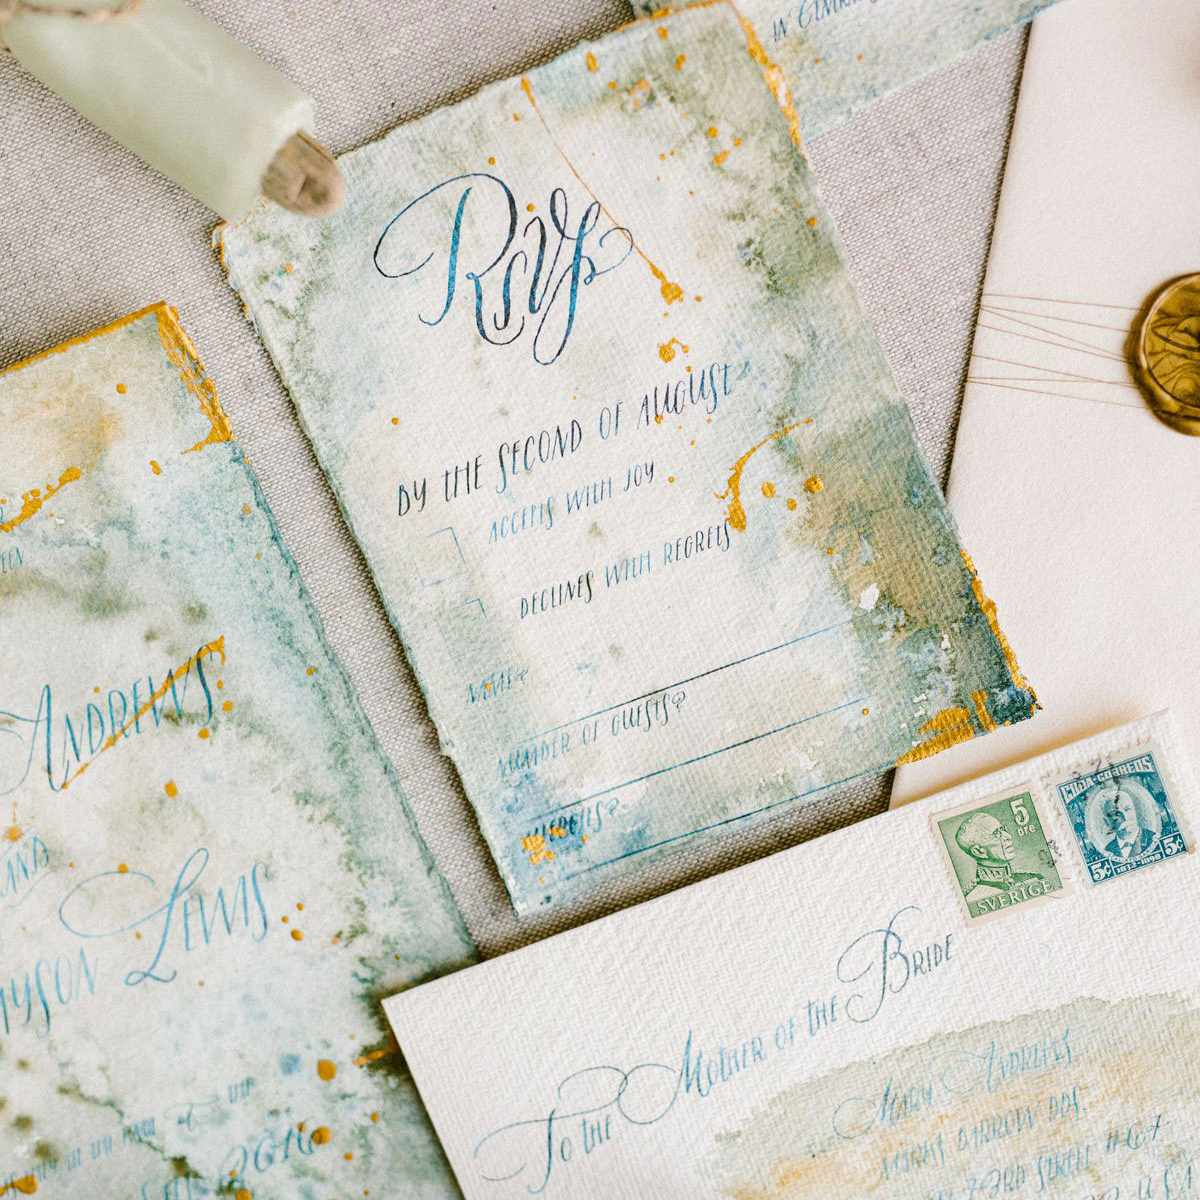 RSVP wedding invitation